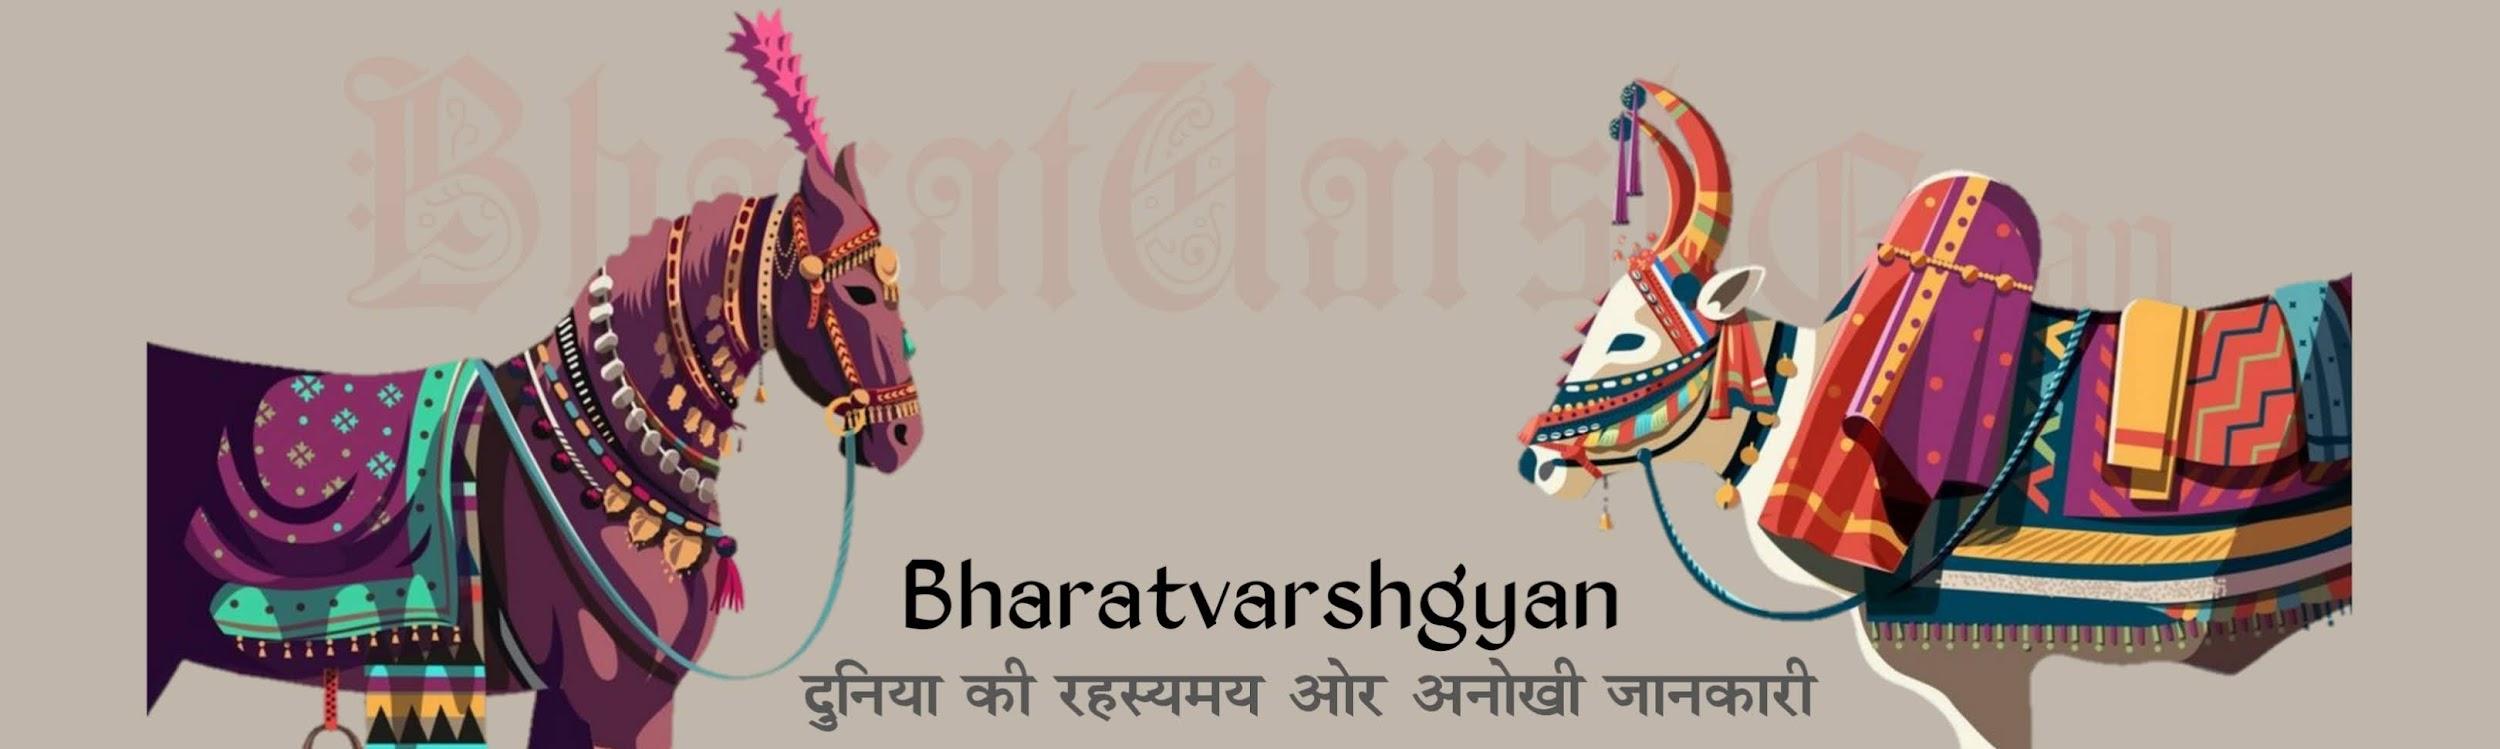 Bharatvarshgyan